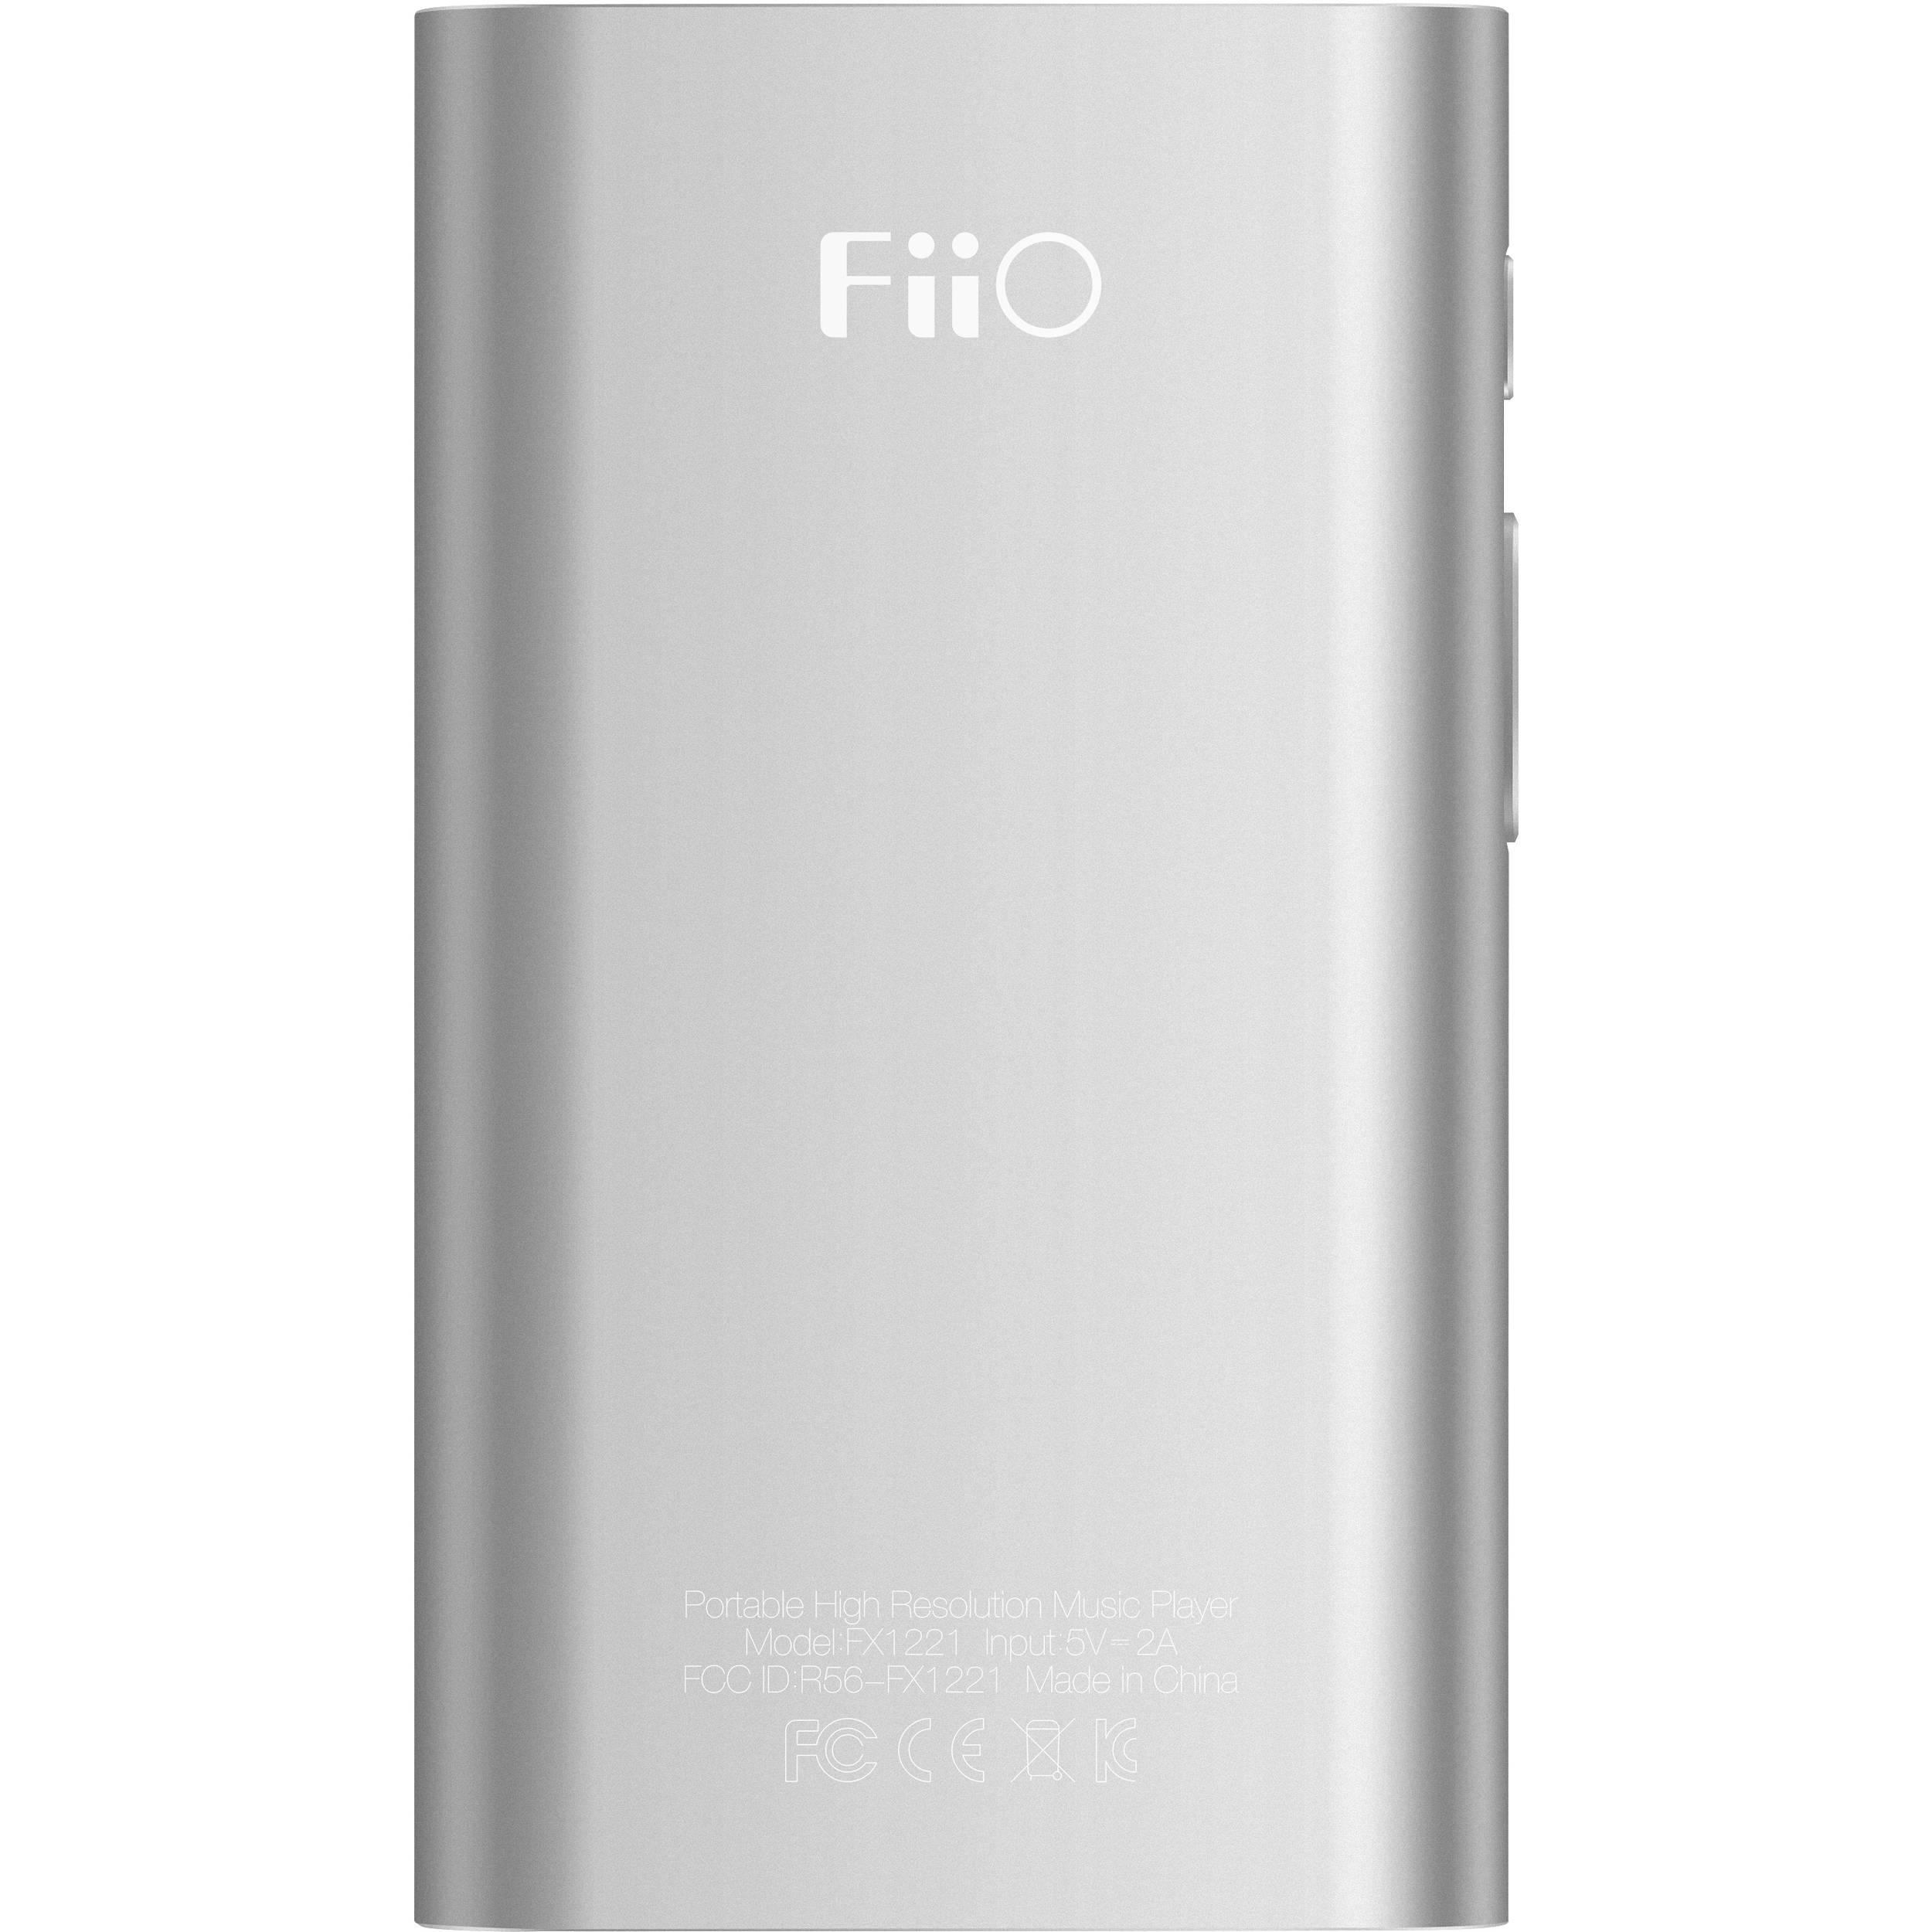 FiiO X1 2nd Generation Portable High-Resolution Lossless Music Player  (Silver)